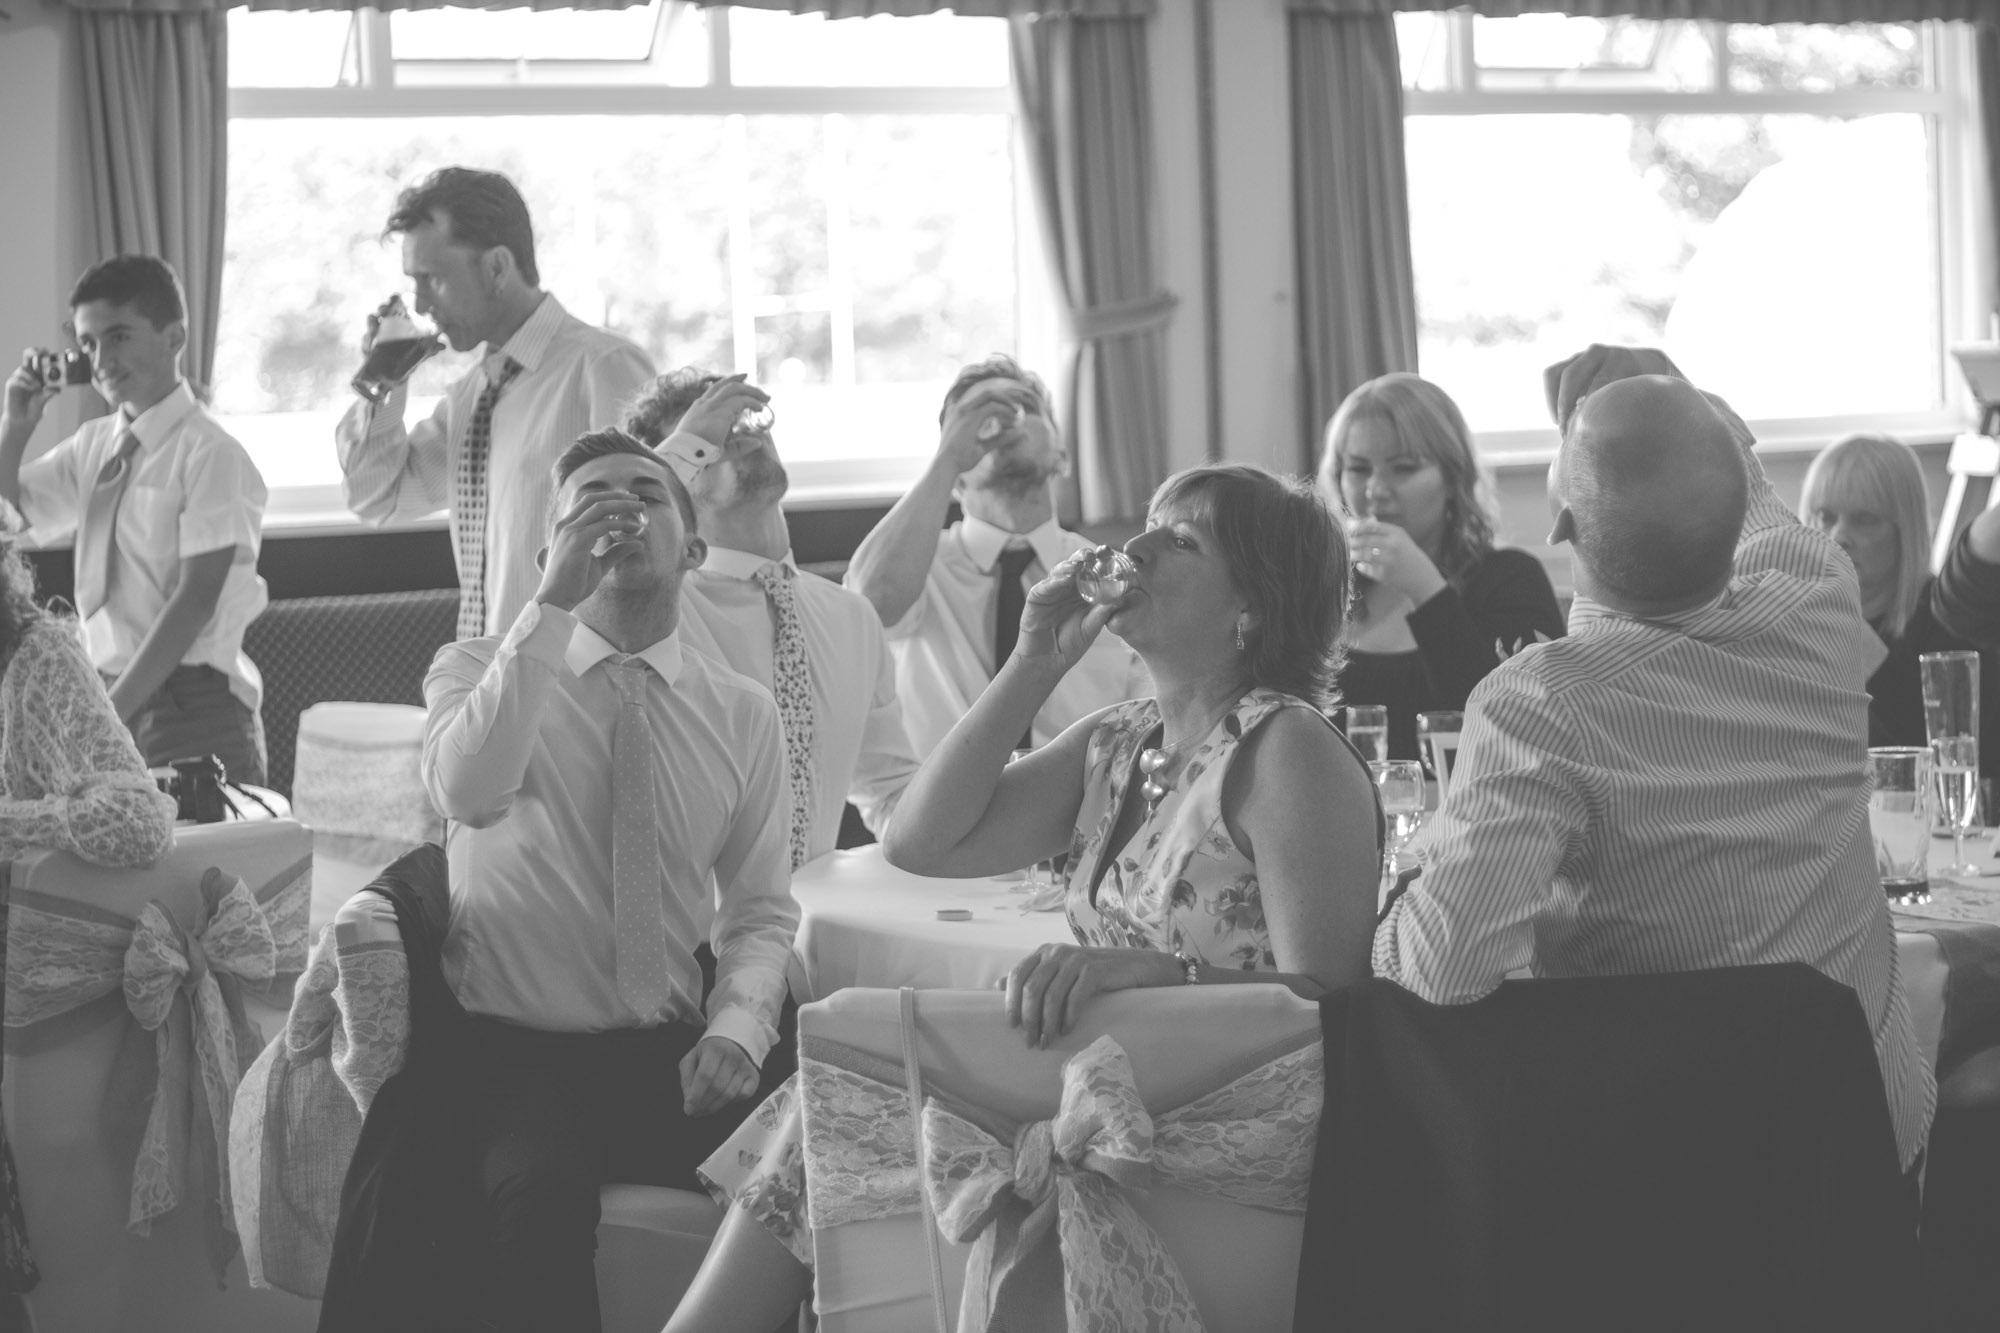 skipton-registry-office-wedding-photography-53.jpg